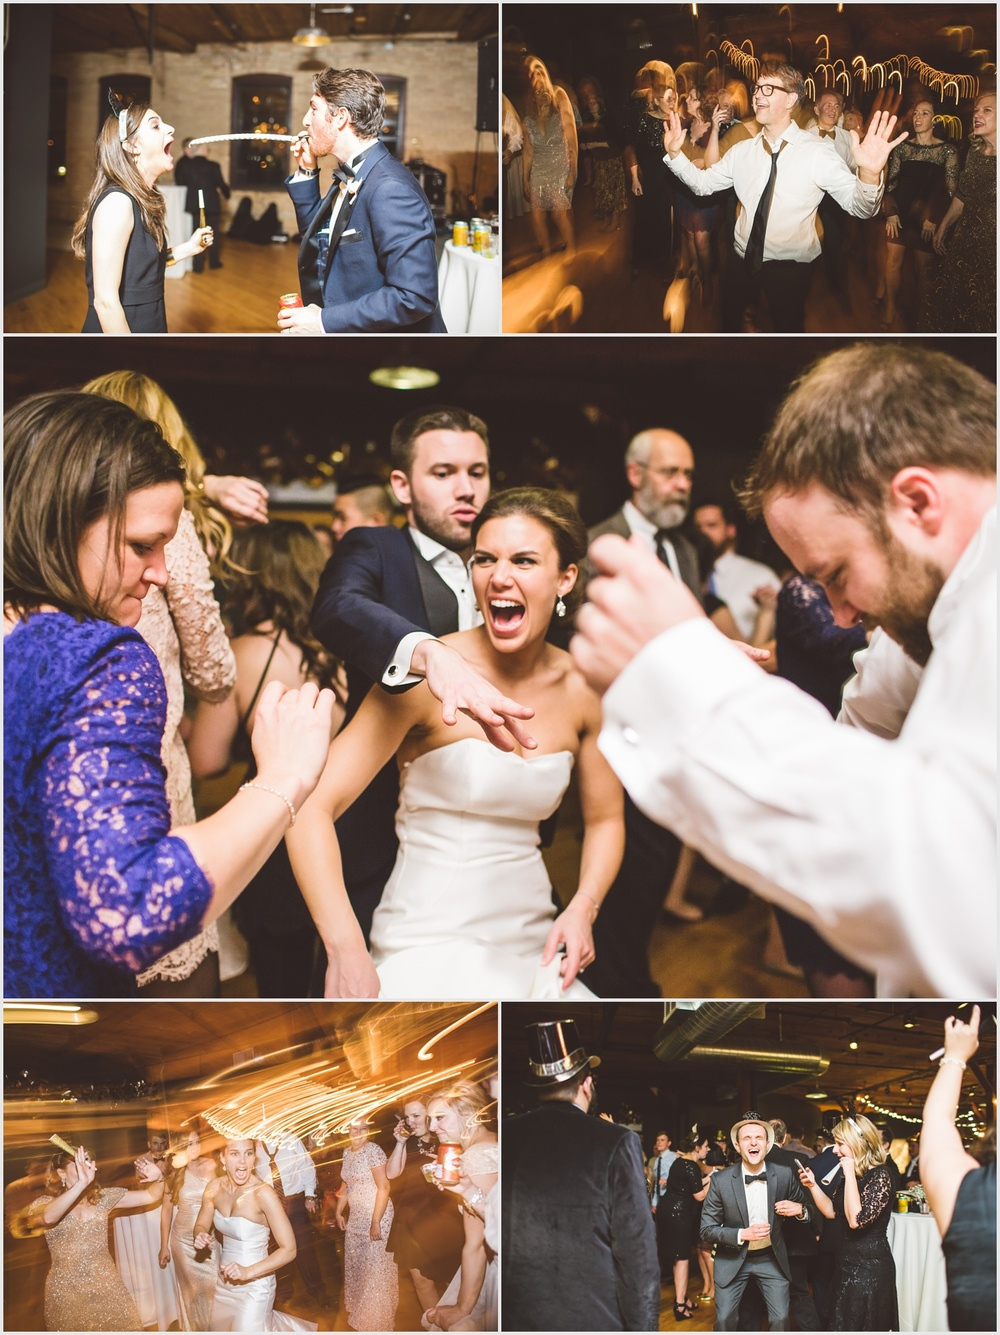 solar_arts_wedding_by_lucas_botz_photography_45.jpg